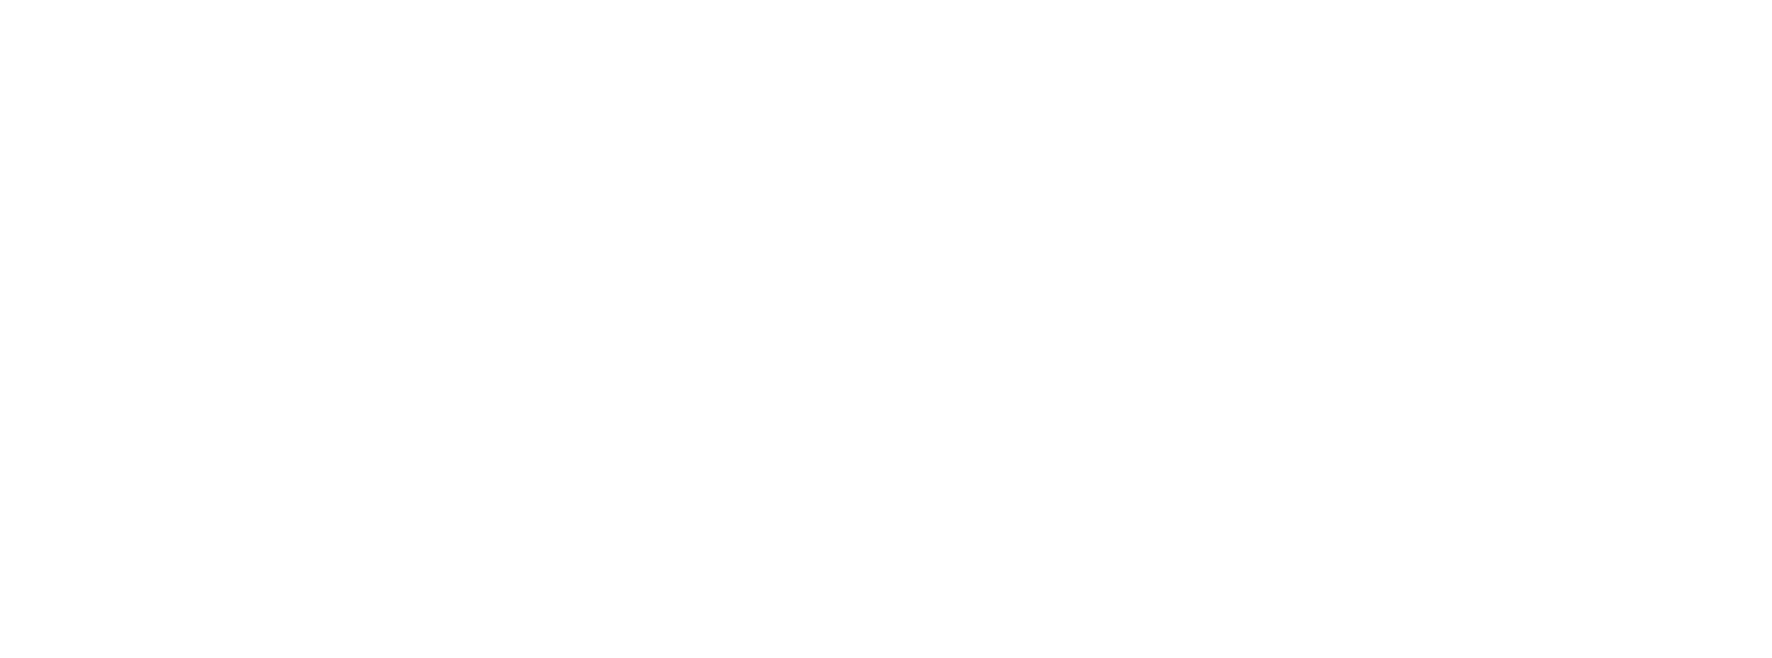 bw_transp - W.png